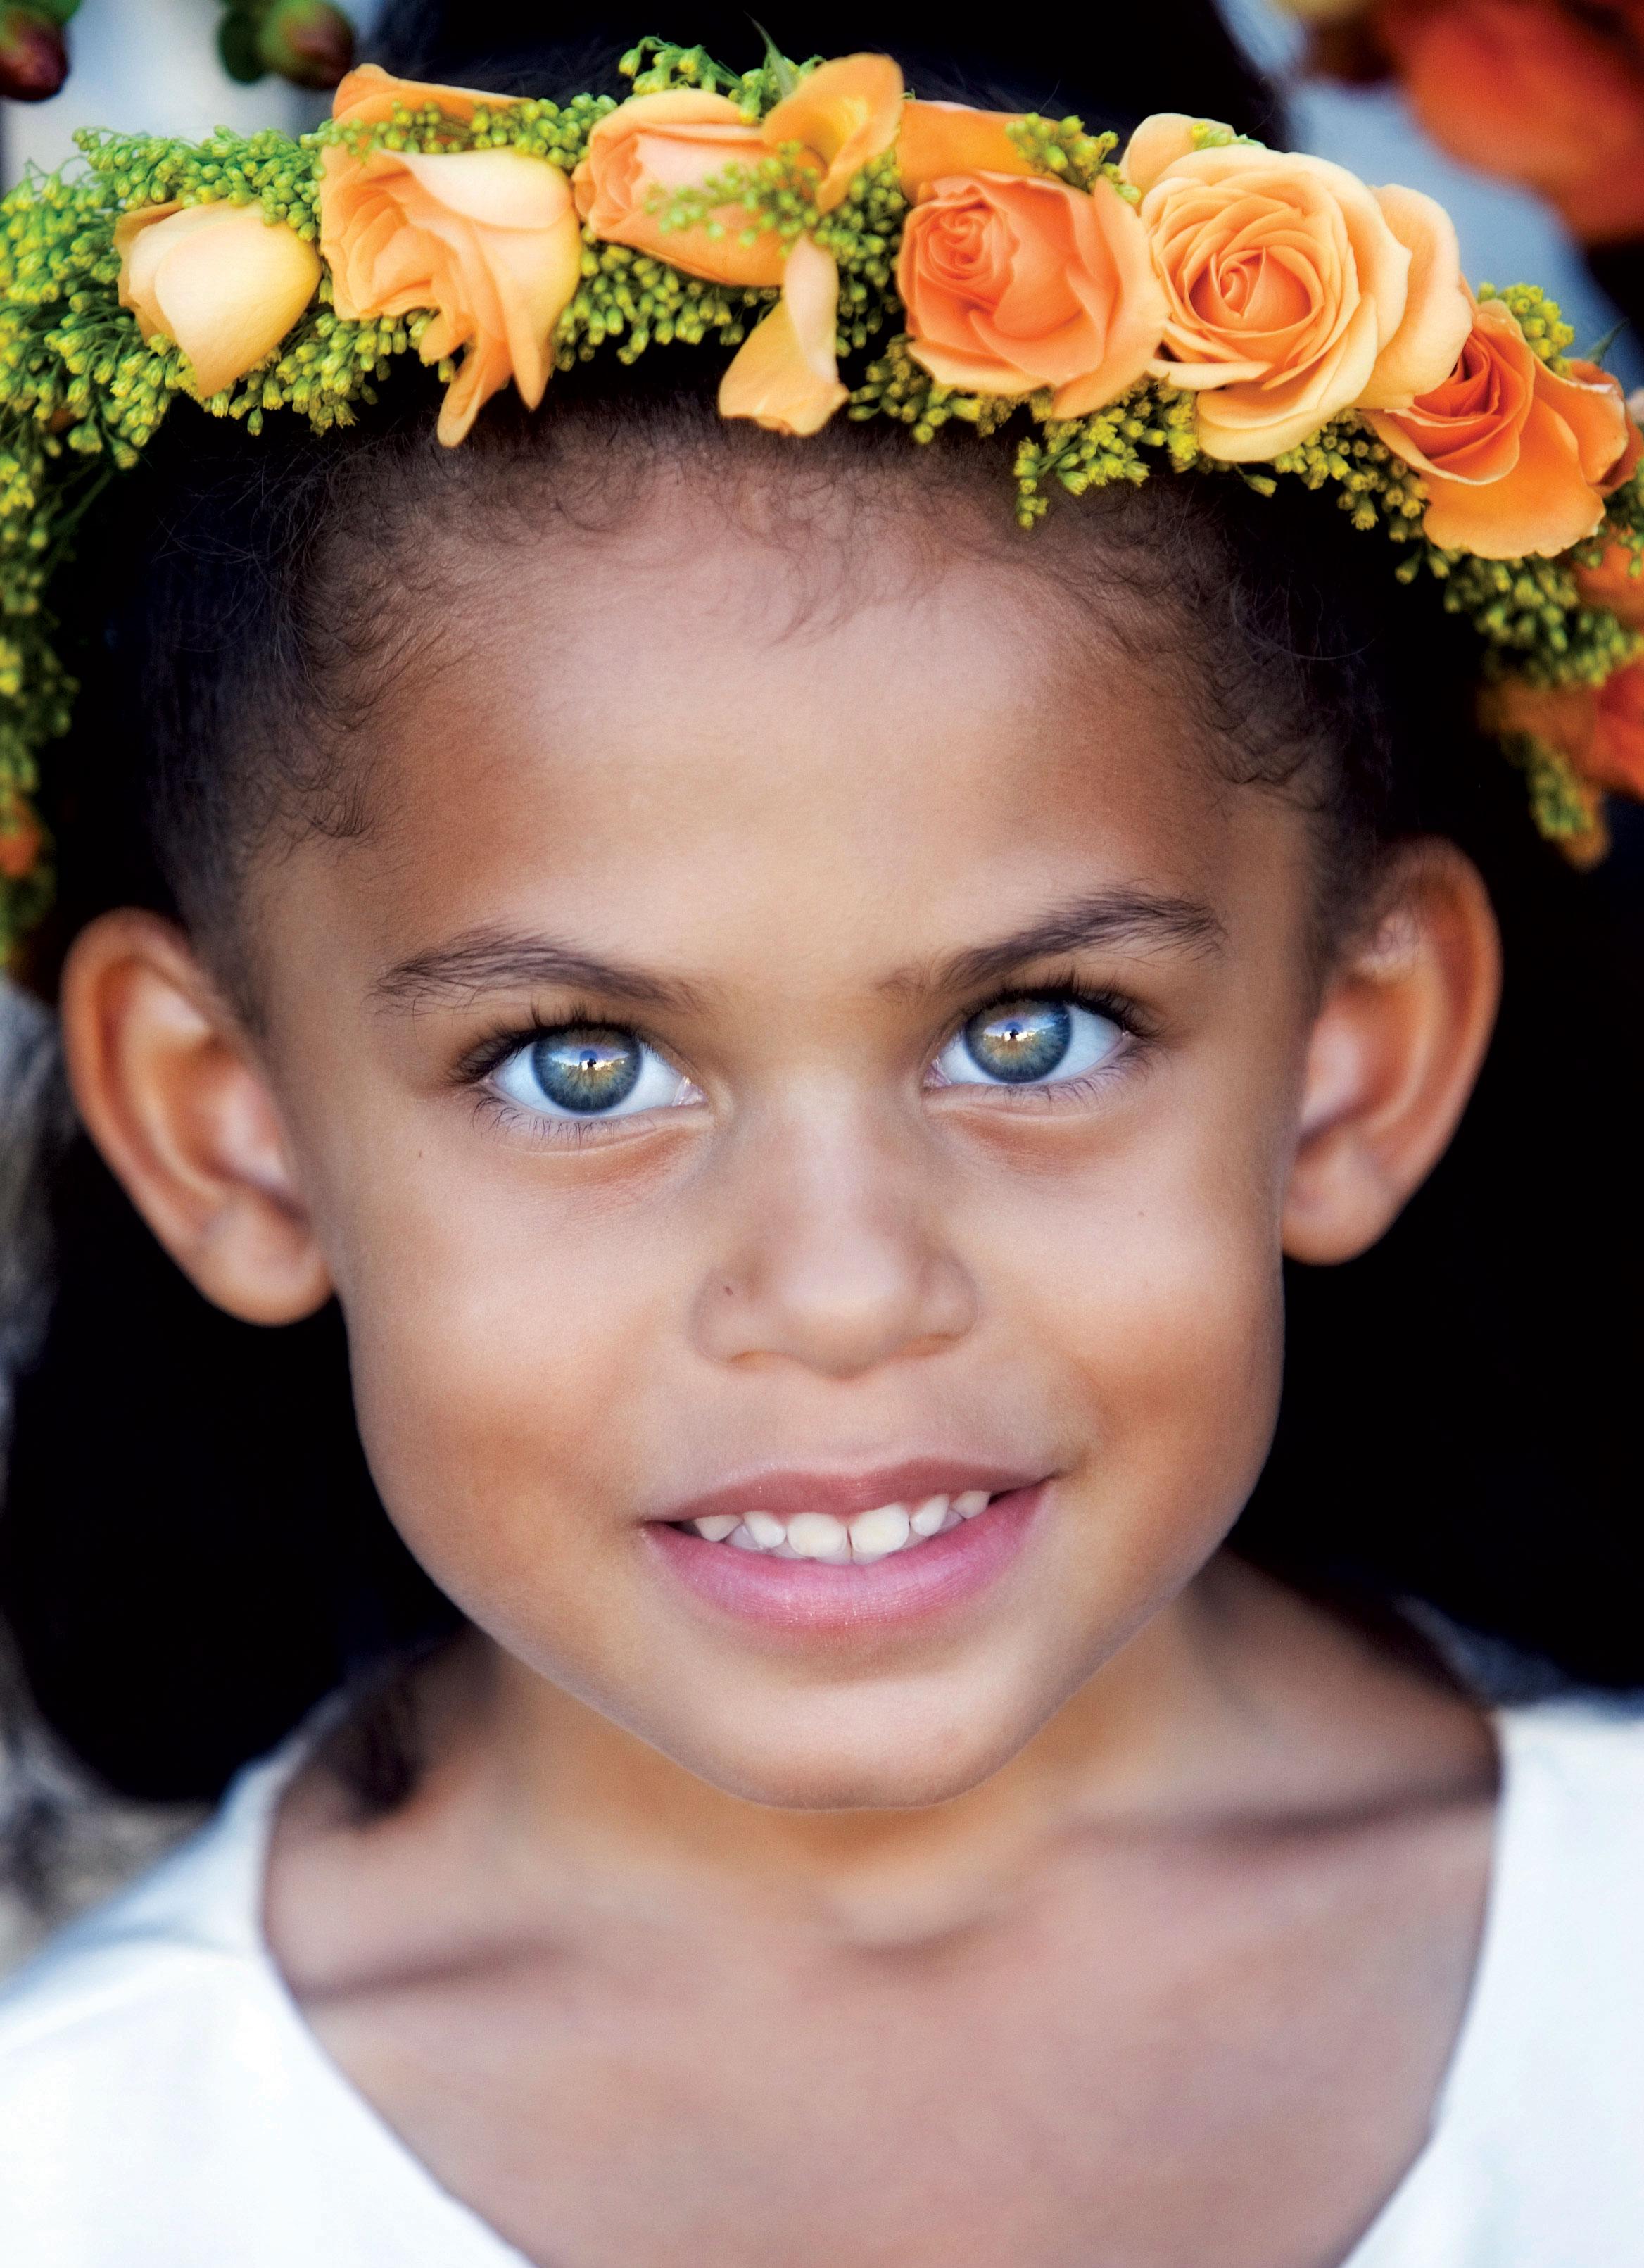 Flower girl style 15 flower crowns to complete her look inside orange flower crown izmirmasajfo Images